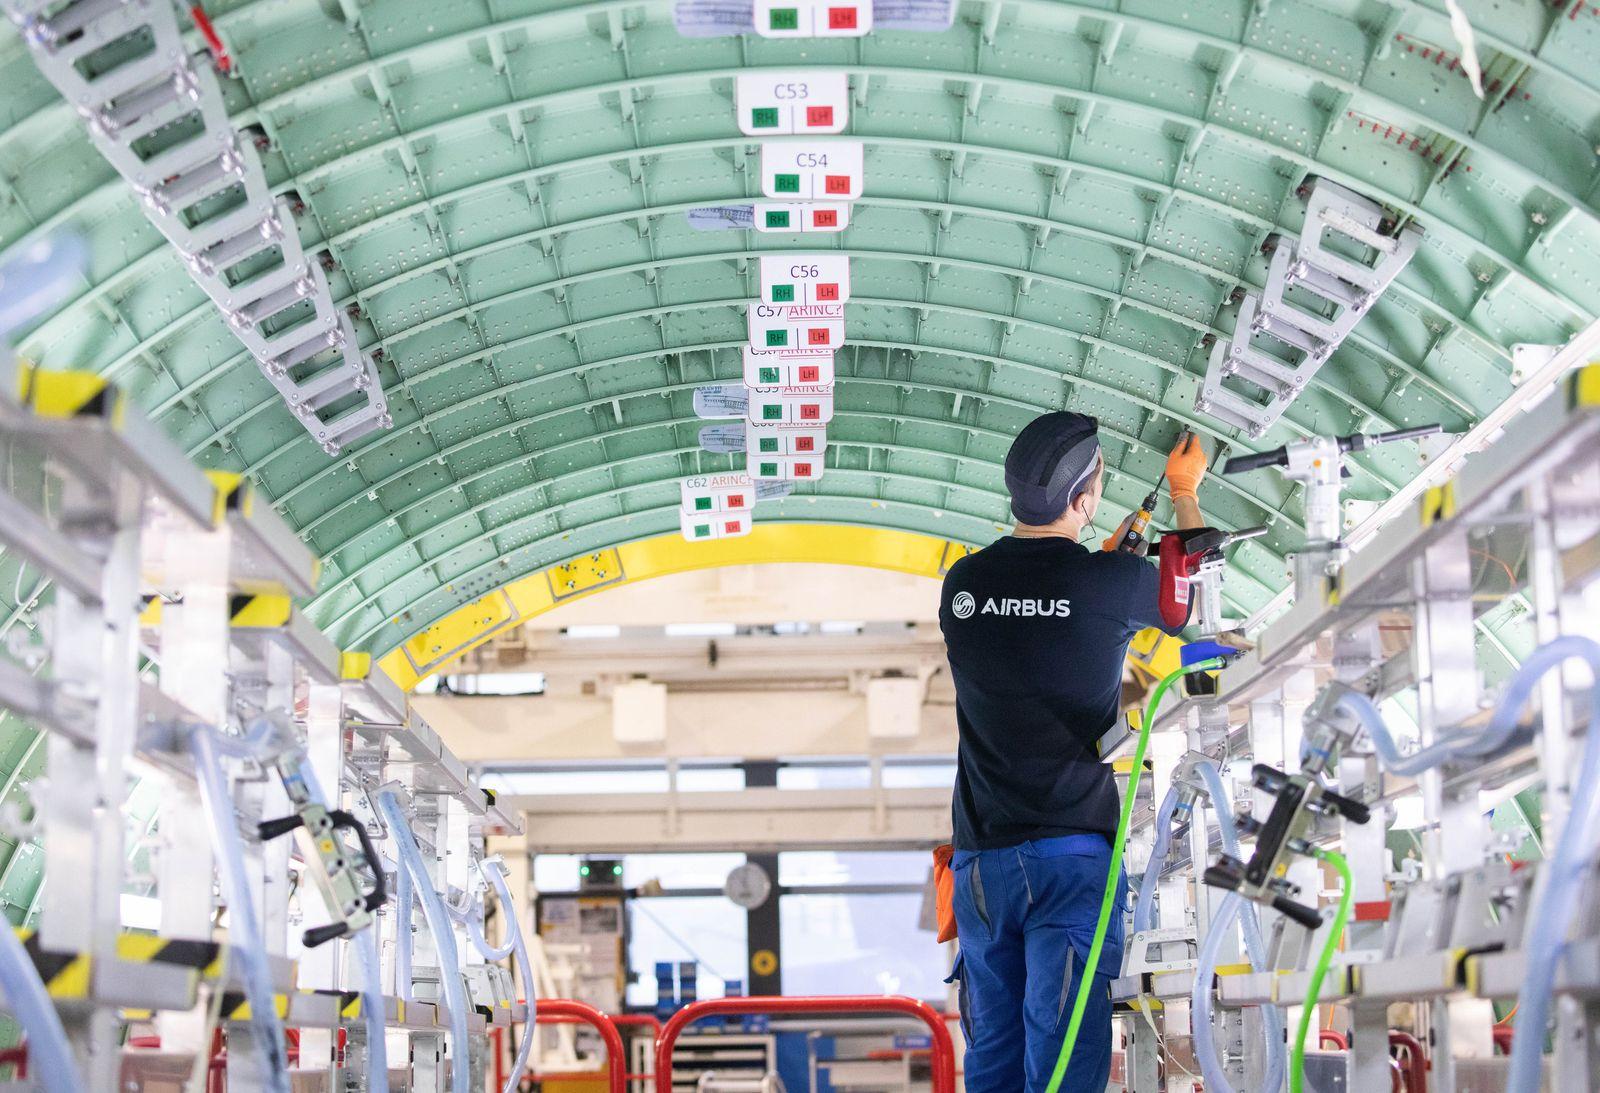 Airbus drosselt Produktion um 40 Prozent - Entlassungen drohen